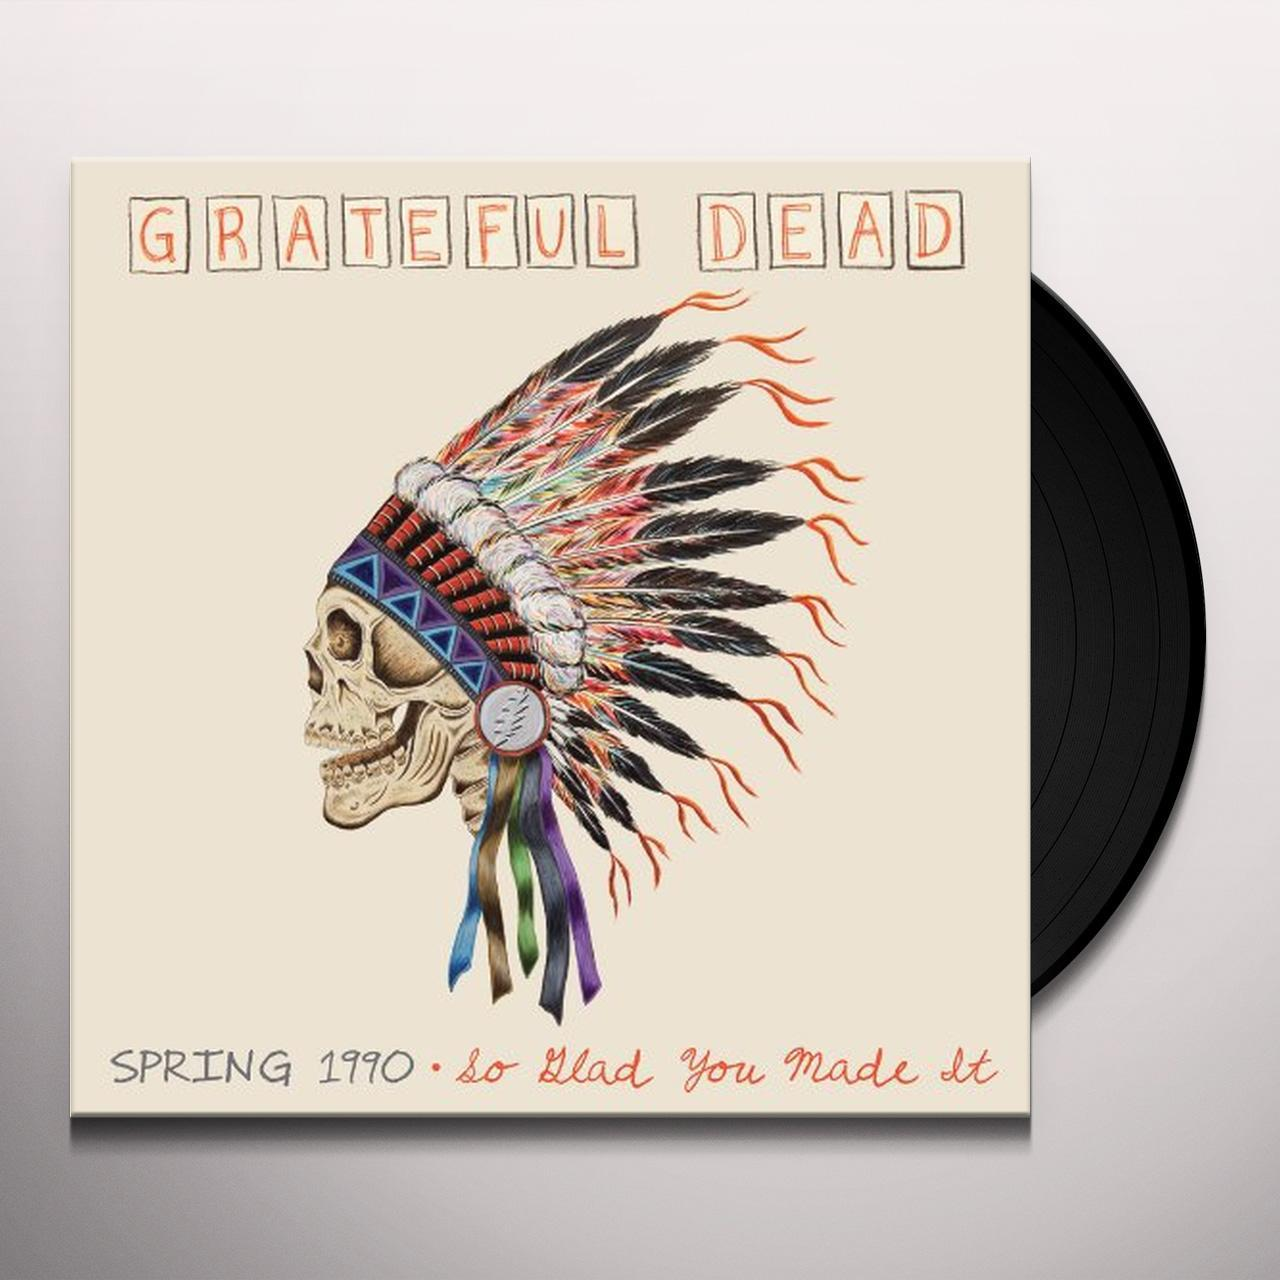 Grateful Dead Spring 1990 So Glad You Made It Vinyl Record